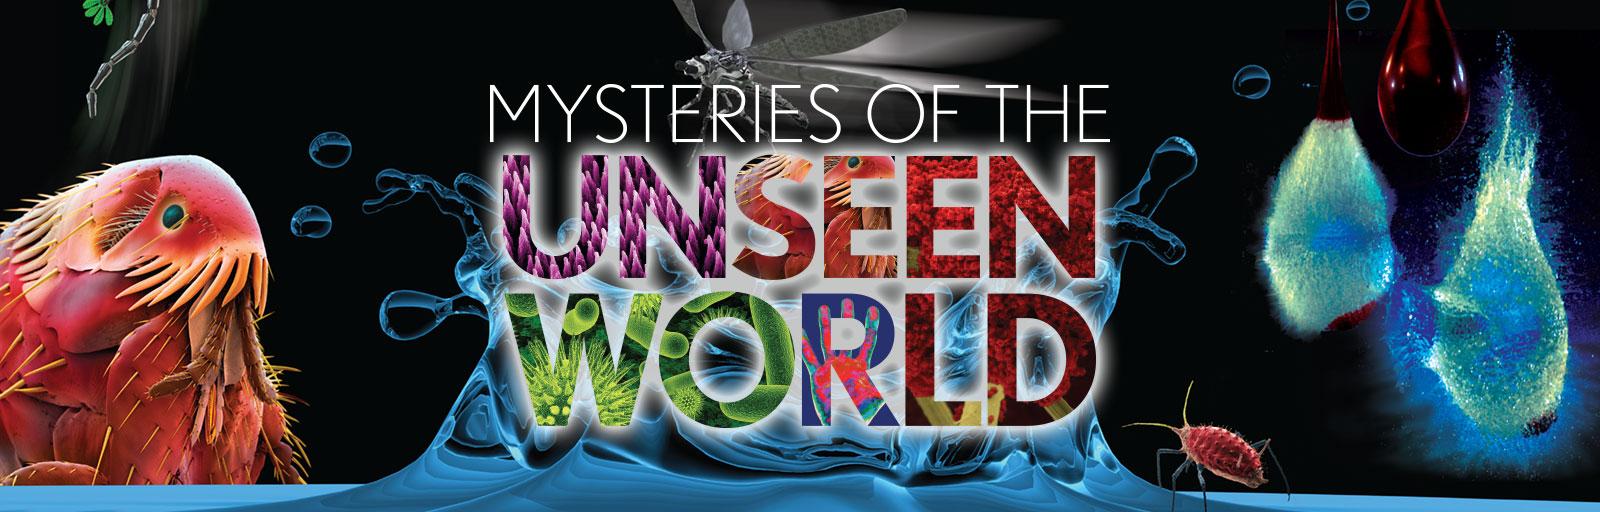 mysteriesofunseenworld-frontrotate